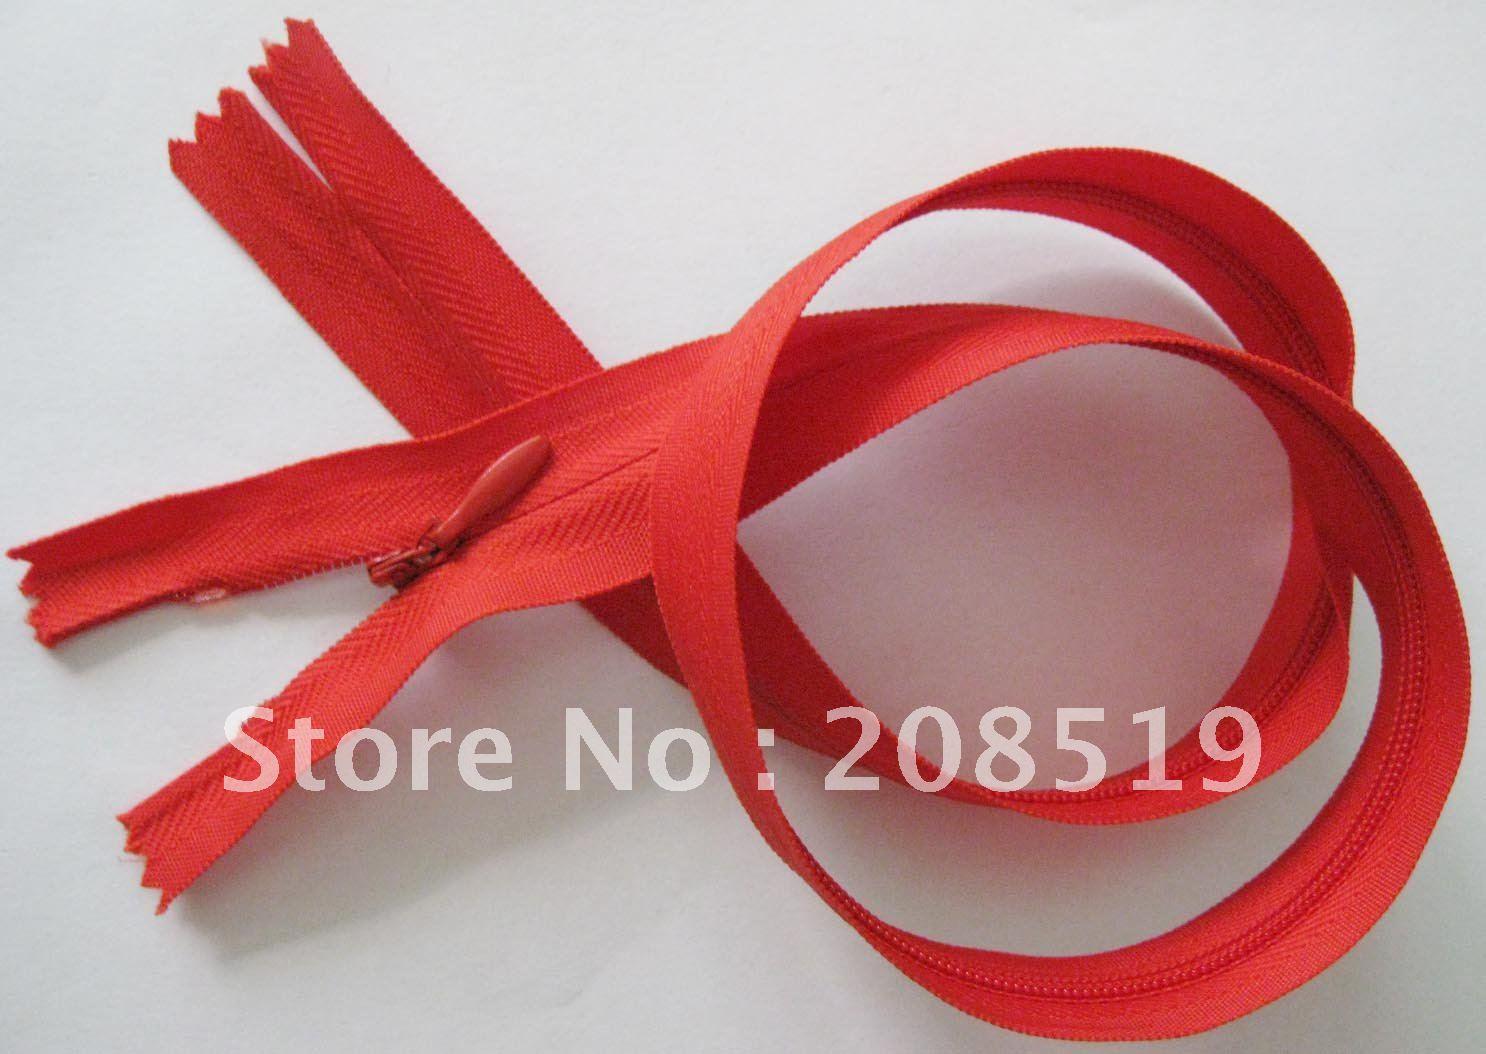 Nylon Fabric Uses Nylon Fabric Used Price